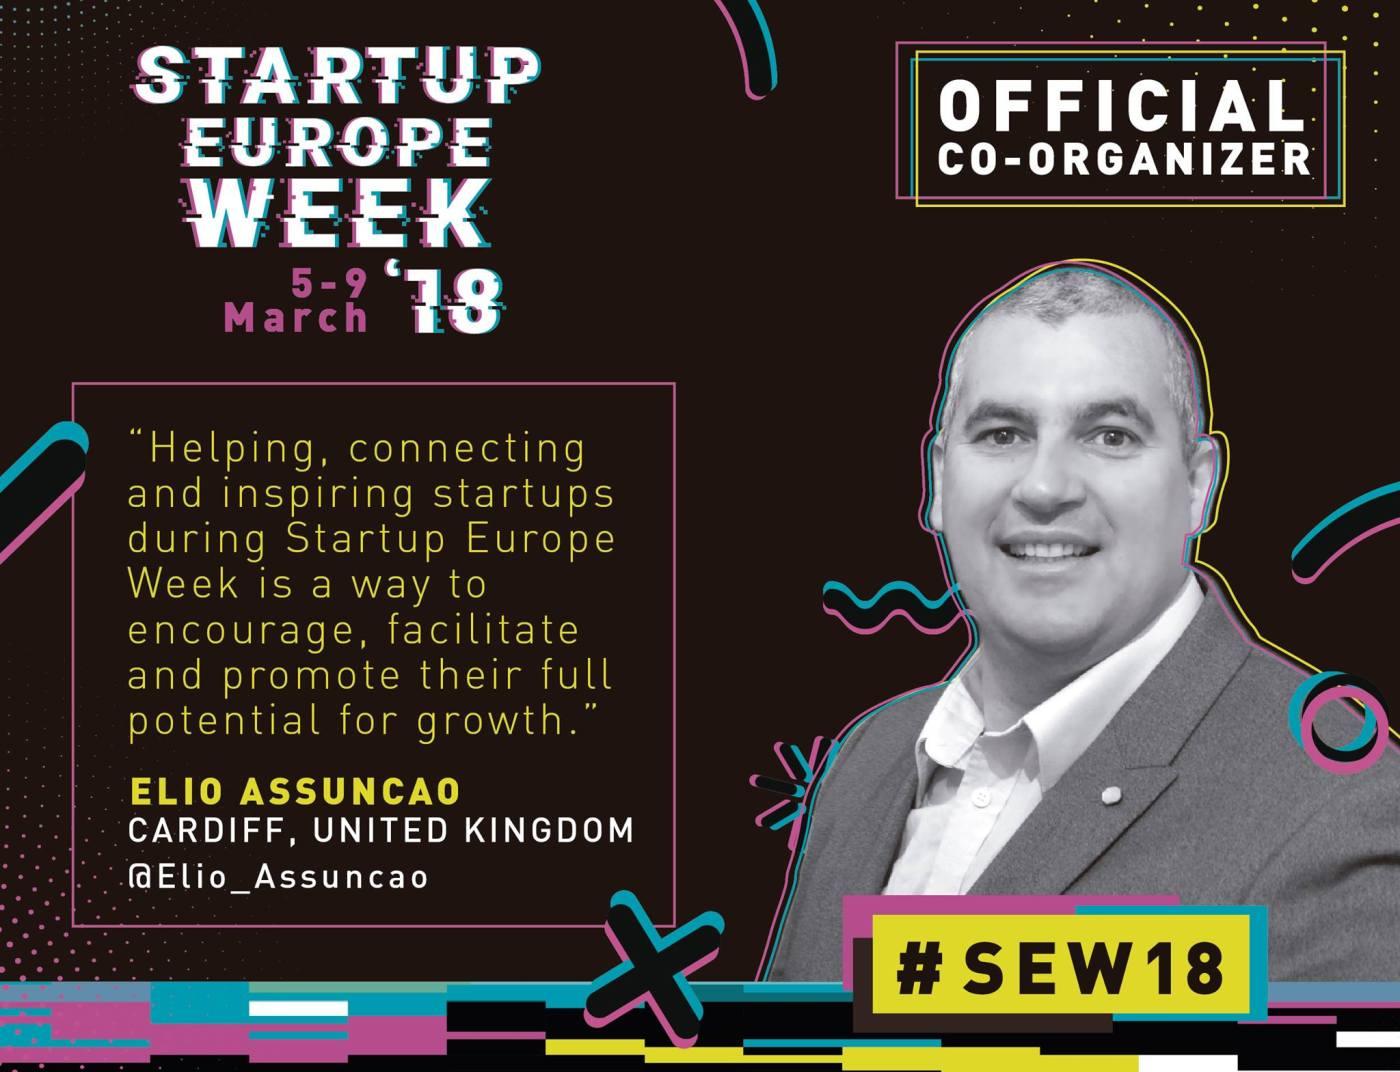 Startup Europe Week Cardiff Elio Assuncao